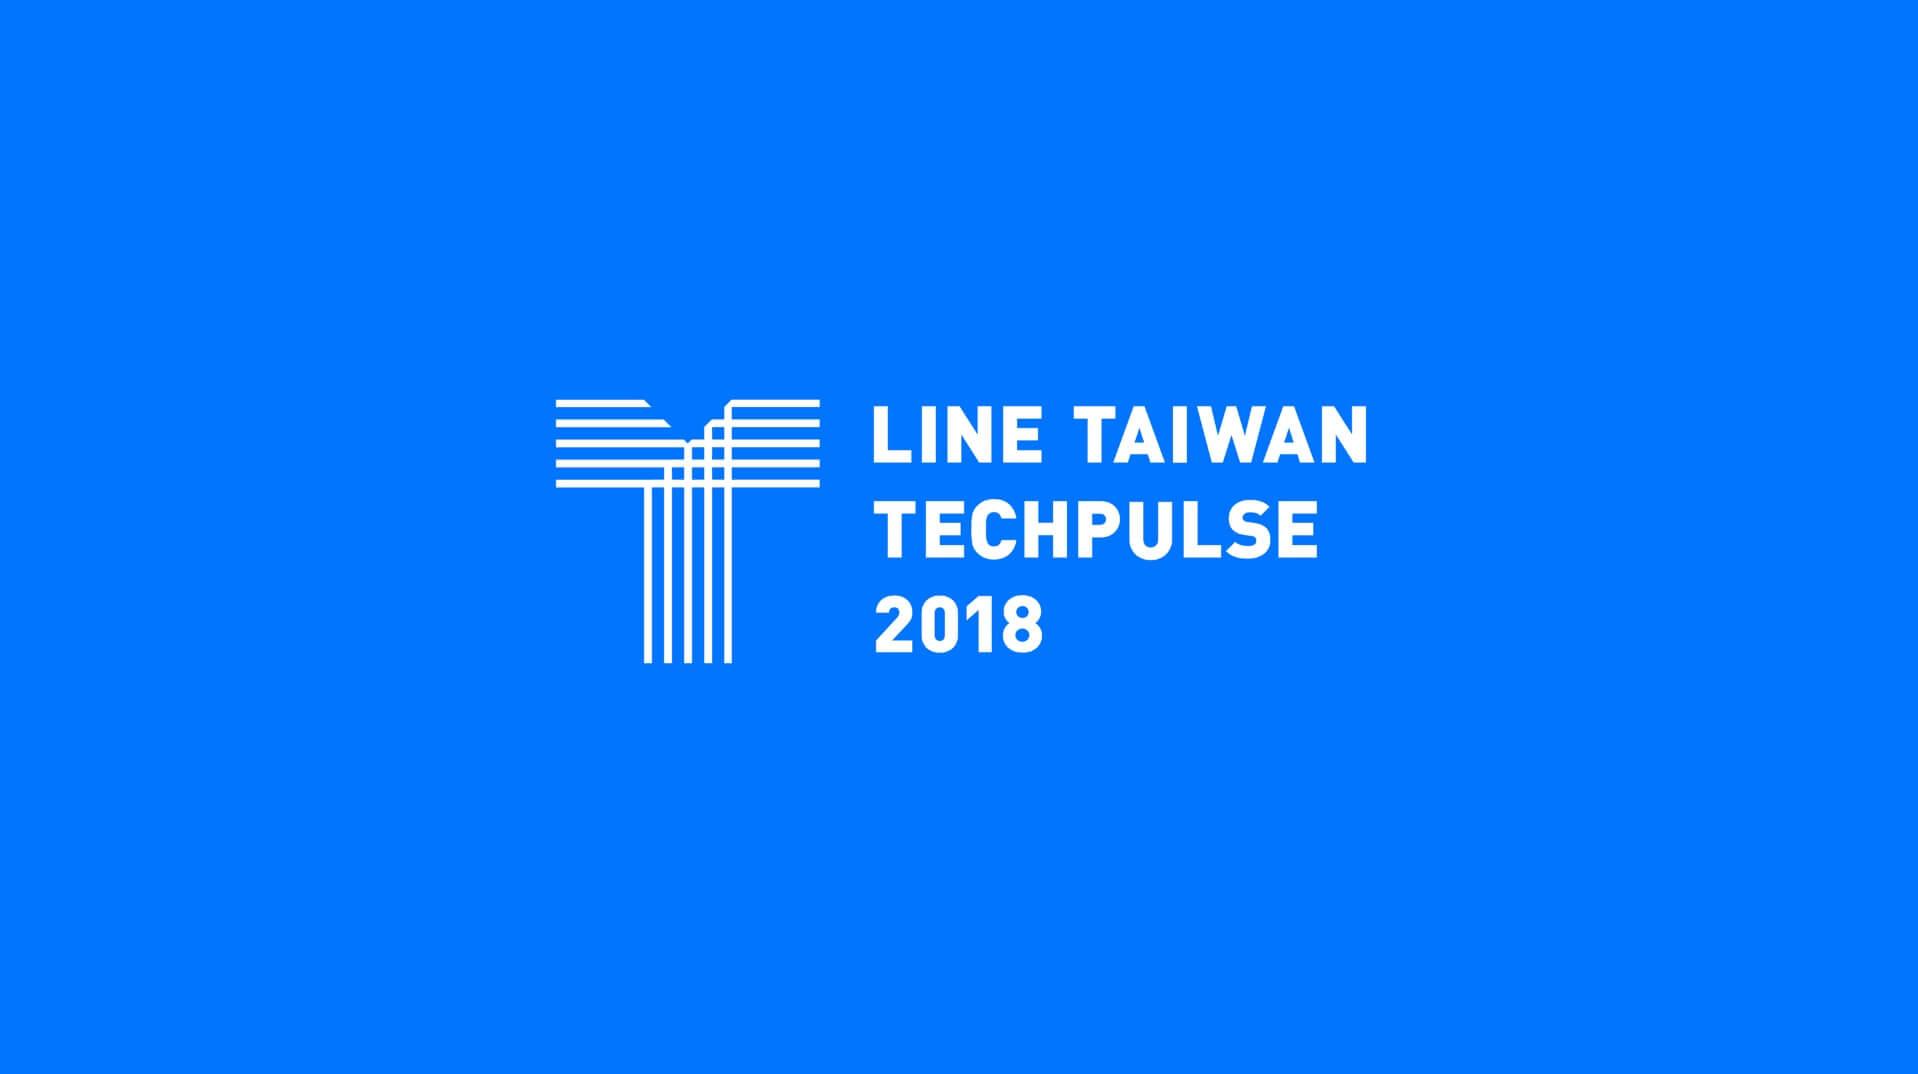 Line taiwan techpulse 2018 開發者大會